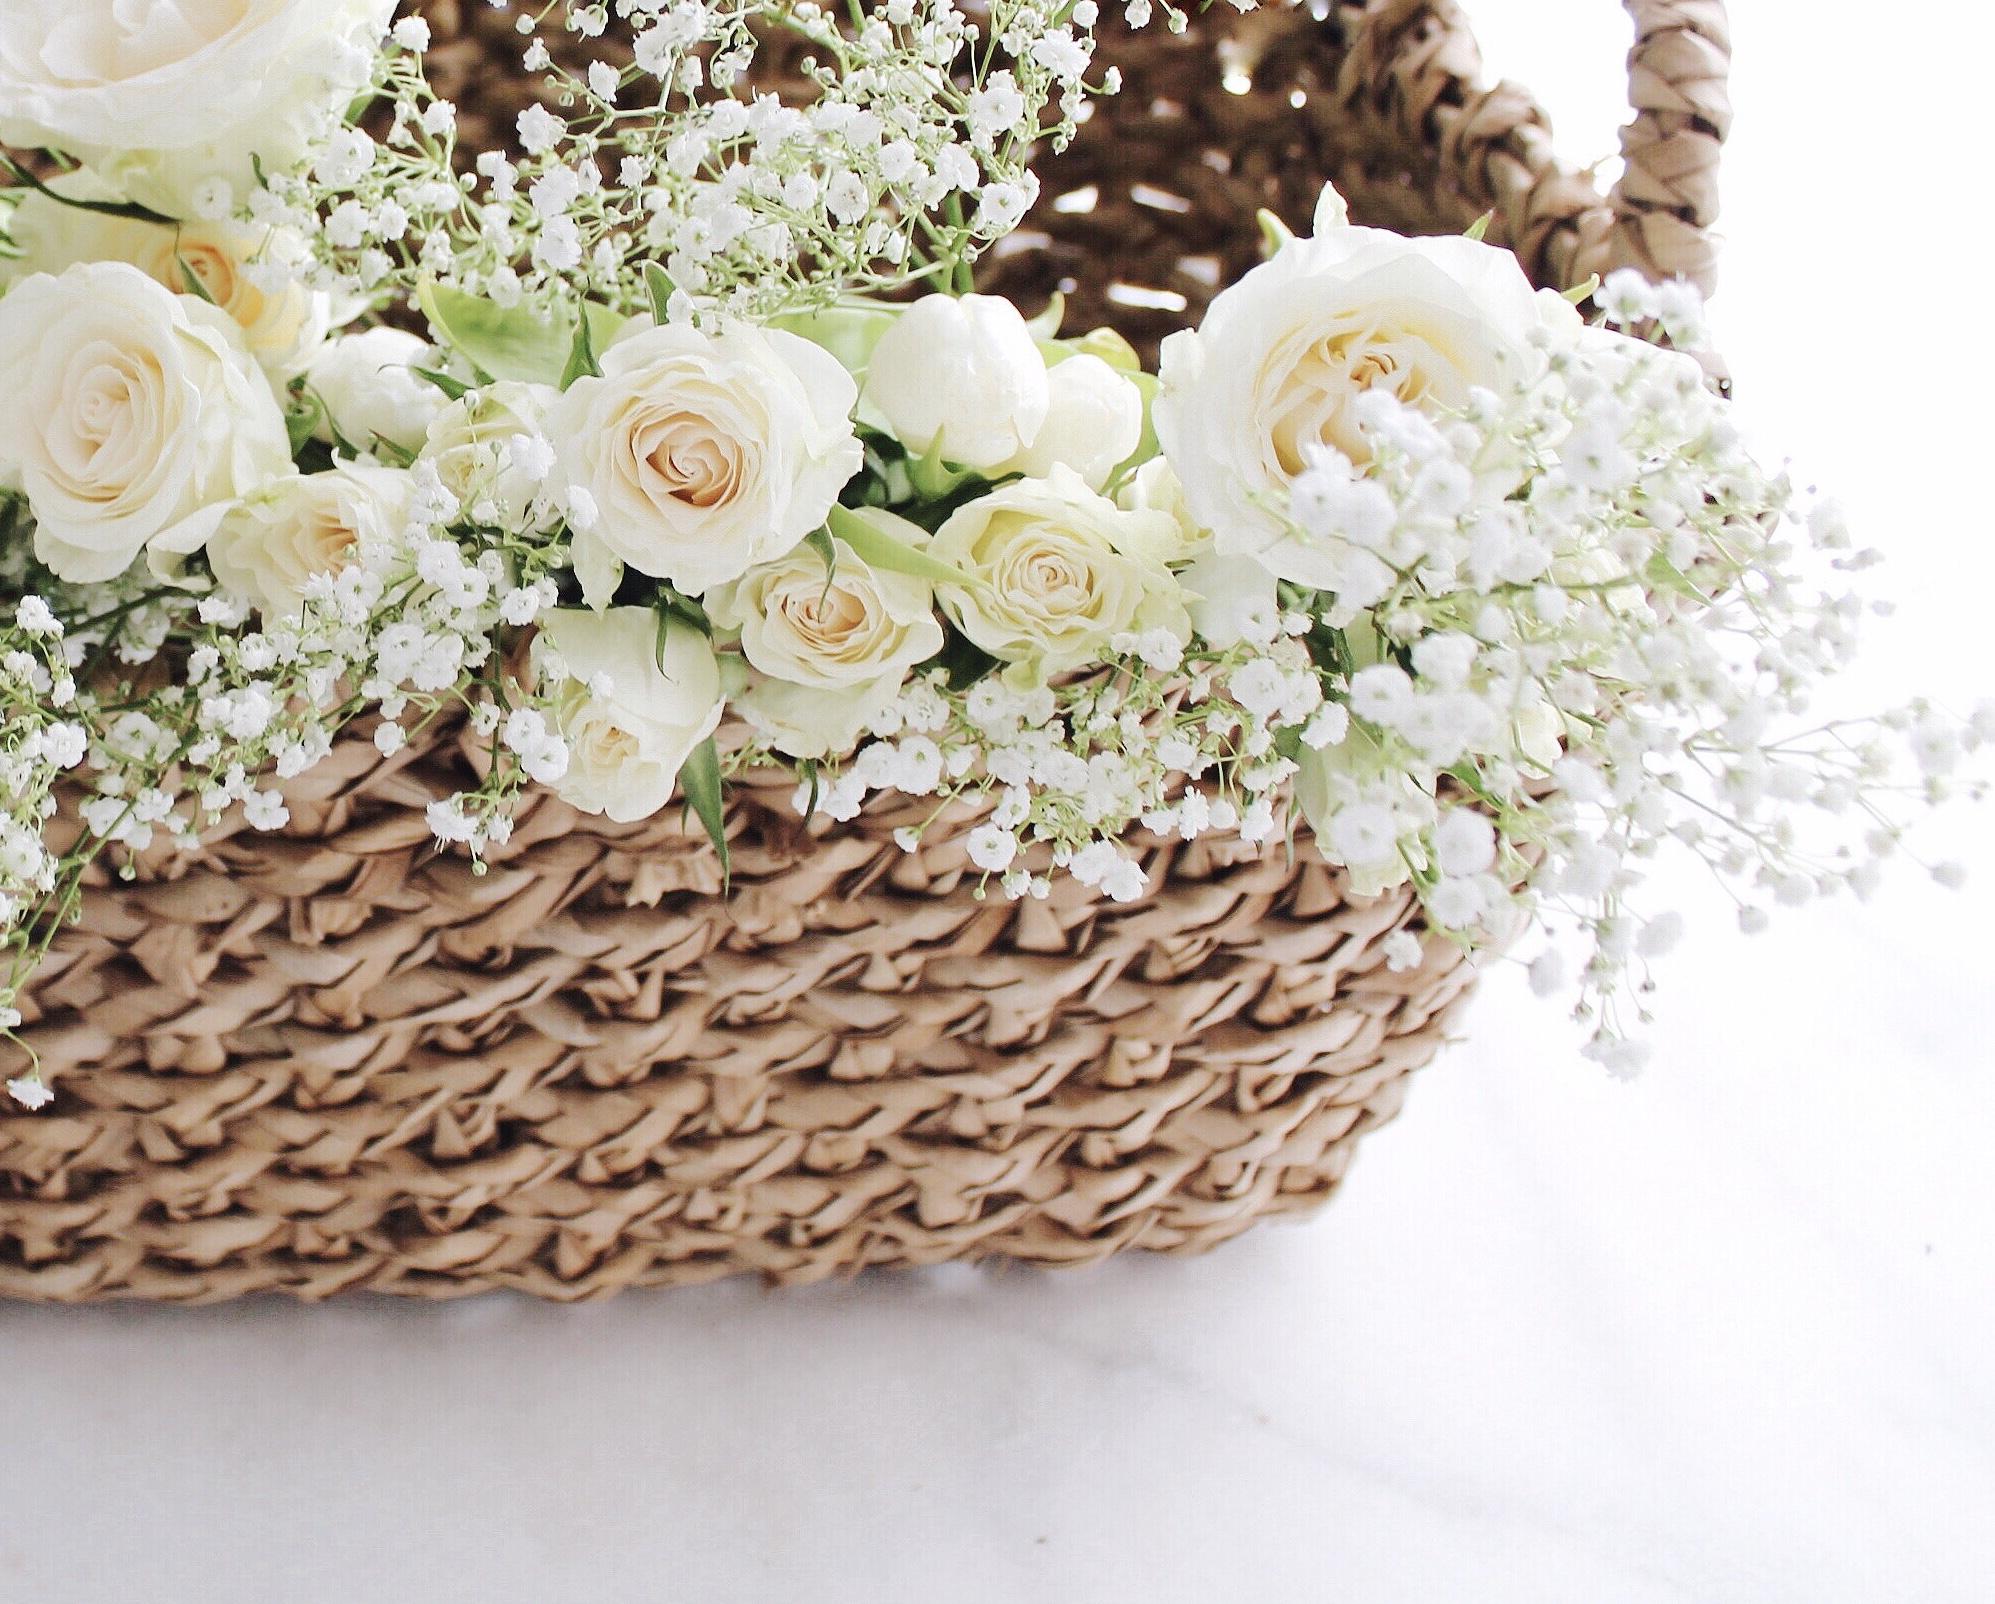 Roost Malu Seagrass Basket